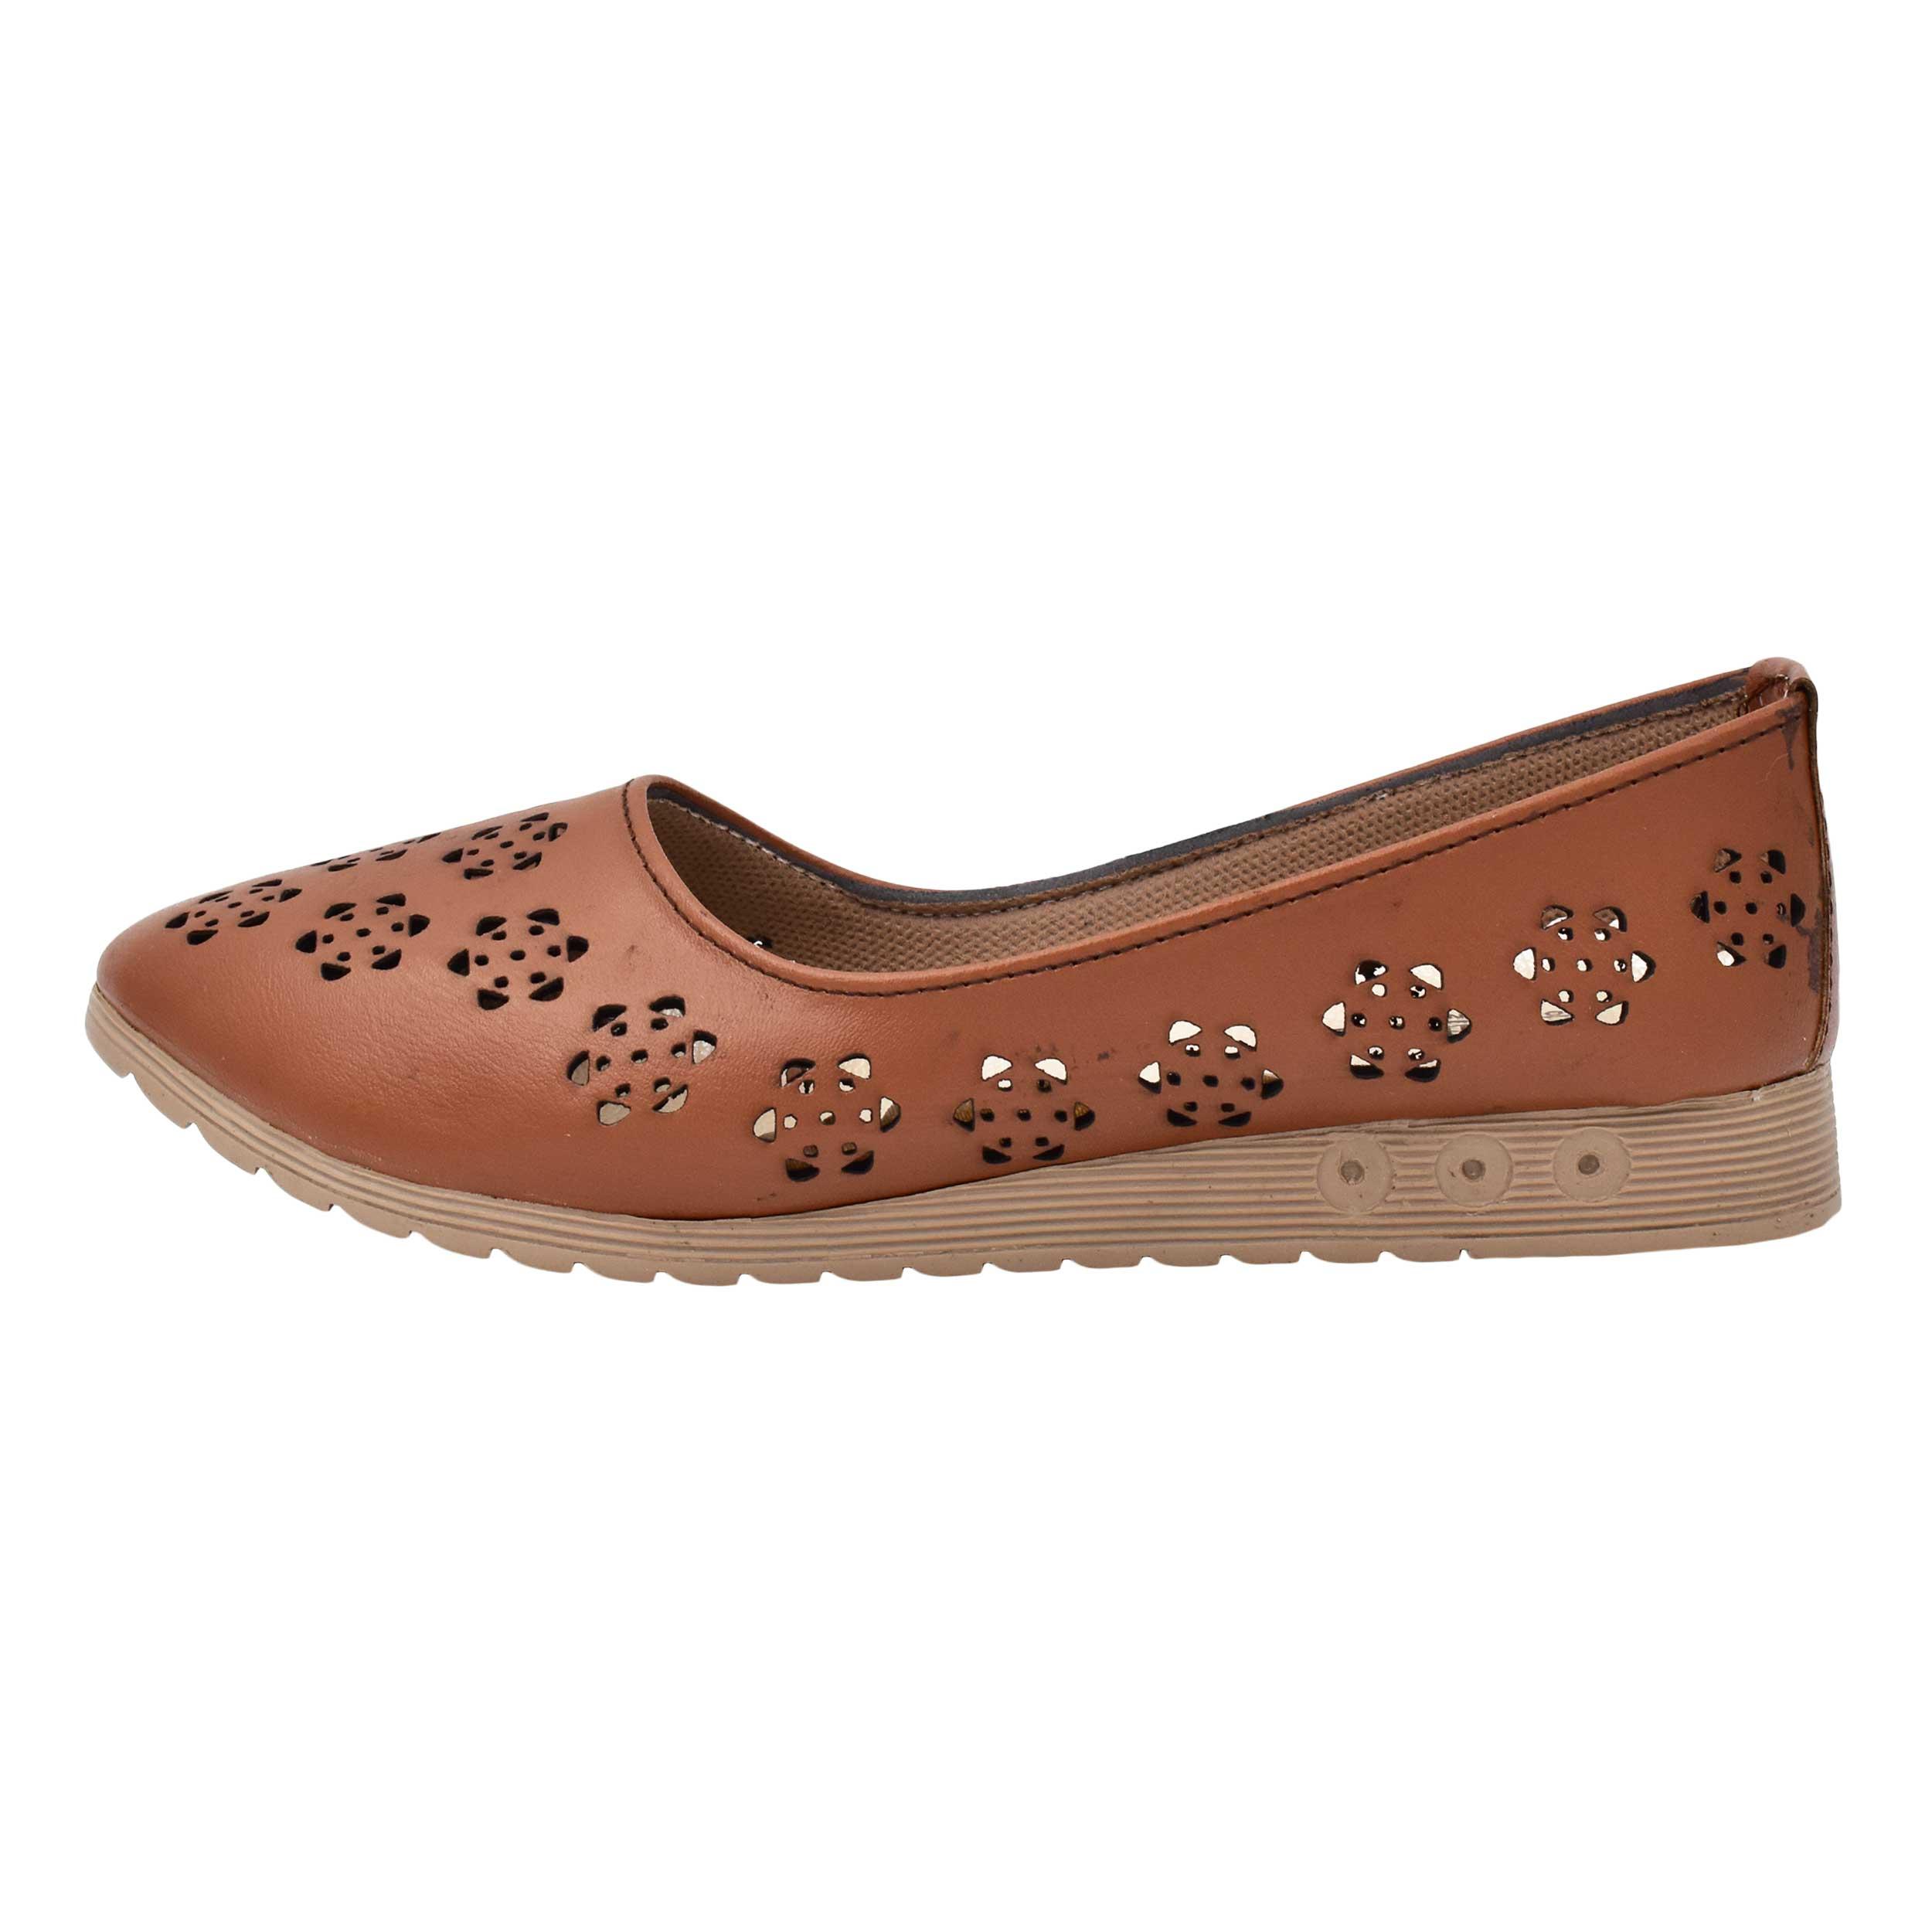 کفش روزمره زنانه کد B1025